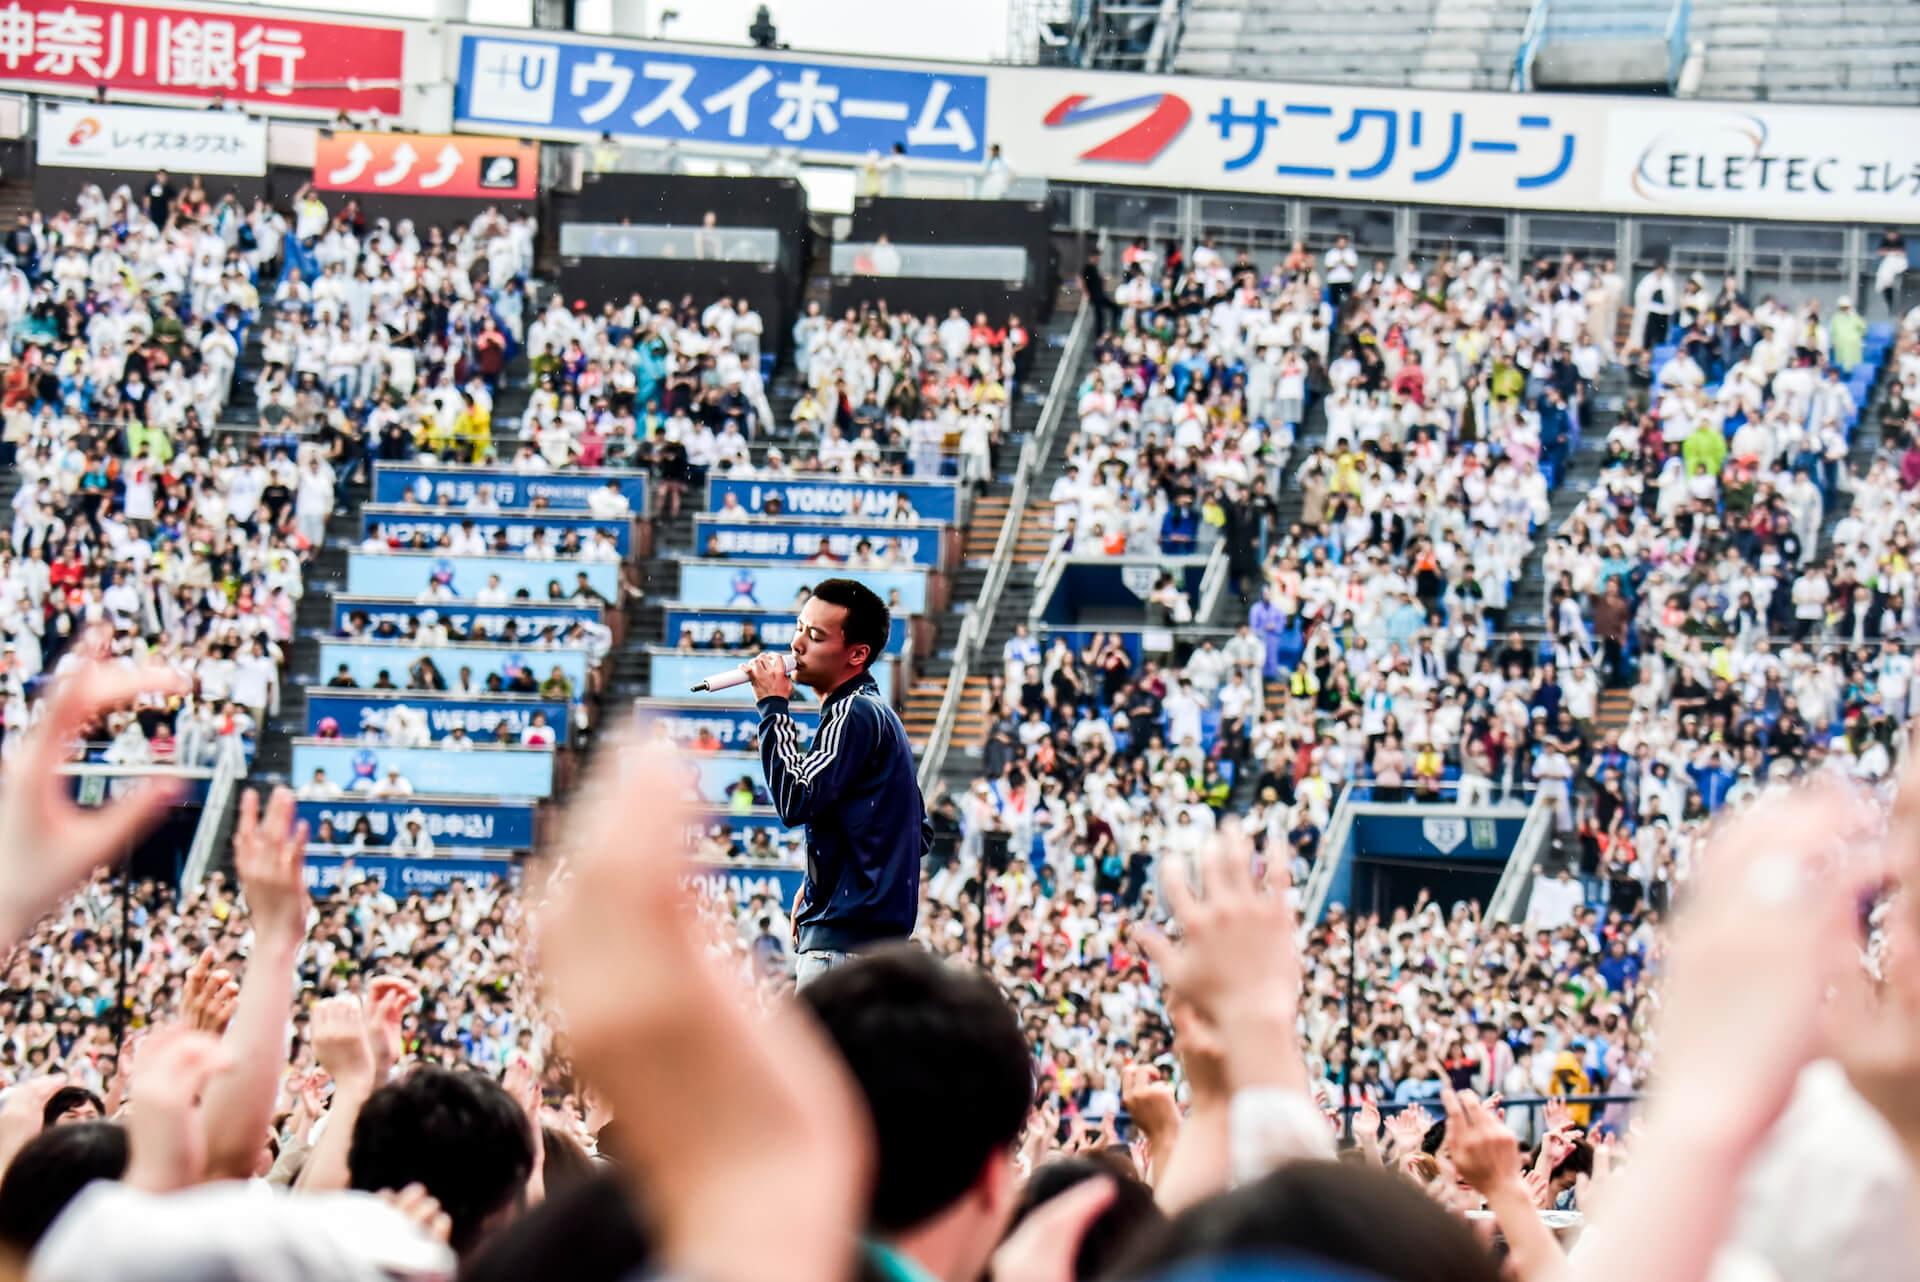 【Photo Documentary】Suchmos THE LIVE 横浜スタジアム 3c114ca7ab82e0deb8653cfb433114bf